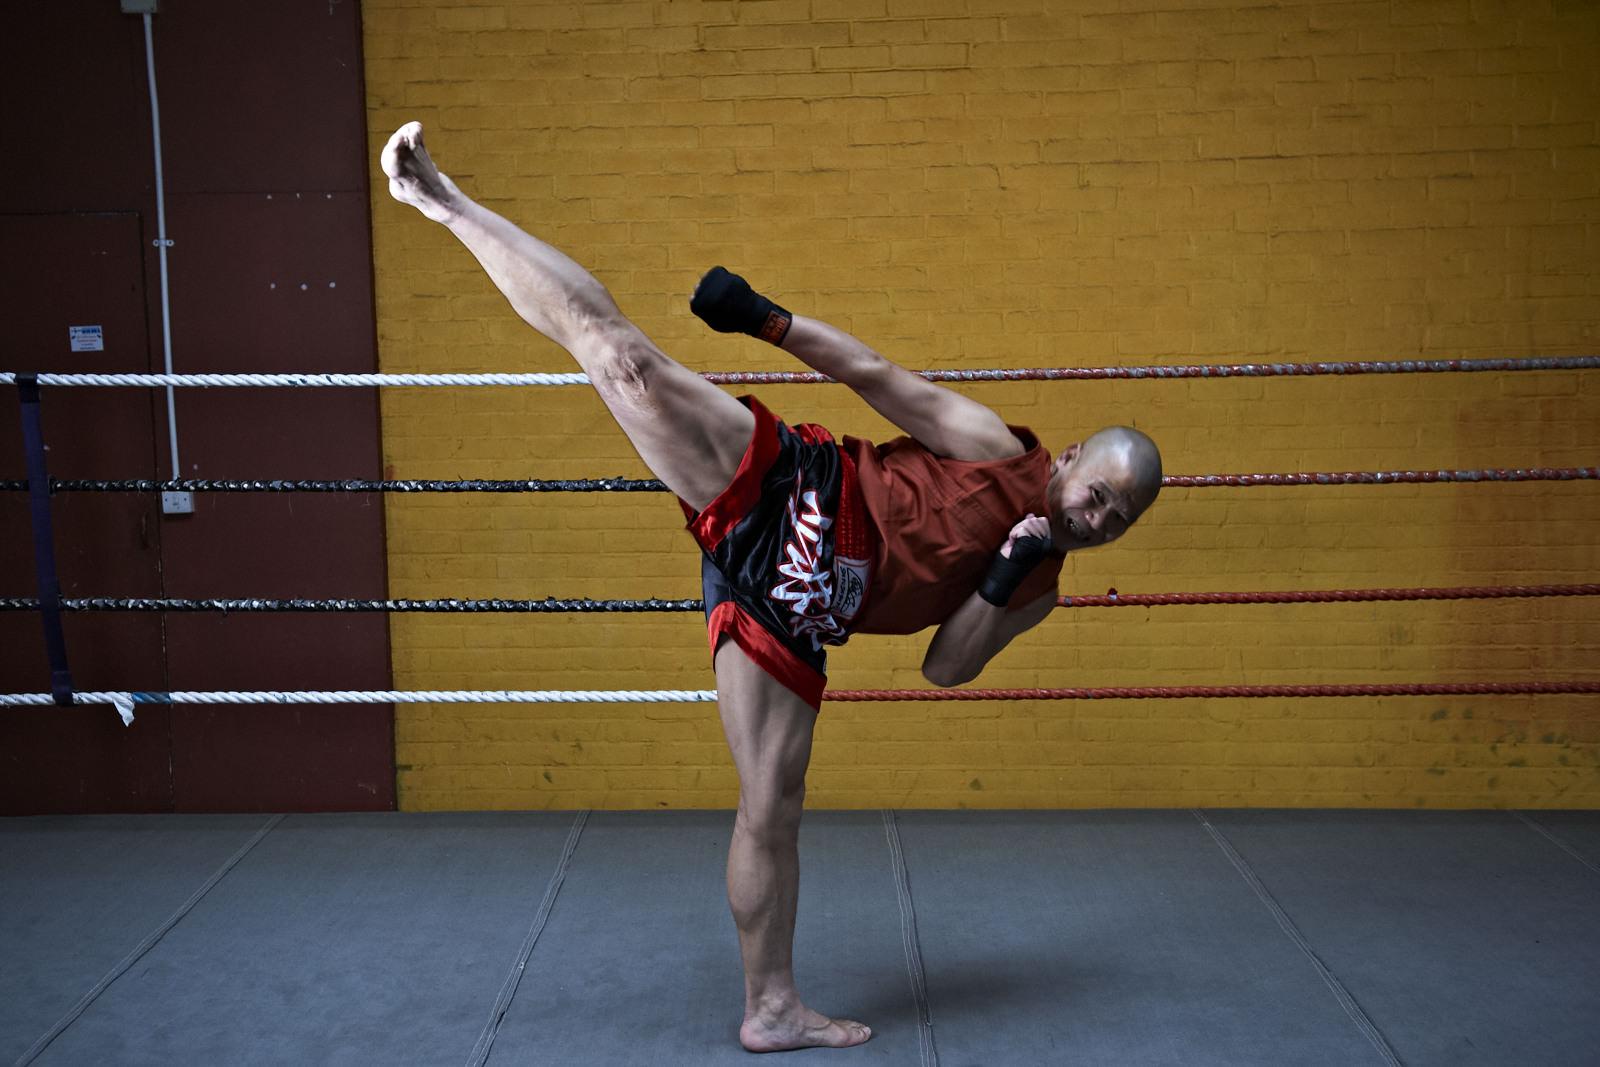 Shaolin temple uk shifu yanzi kick 12.jpg